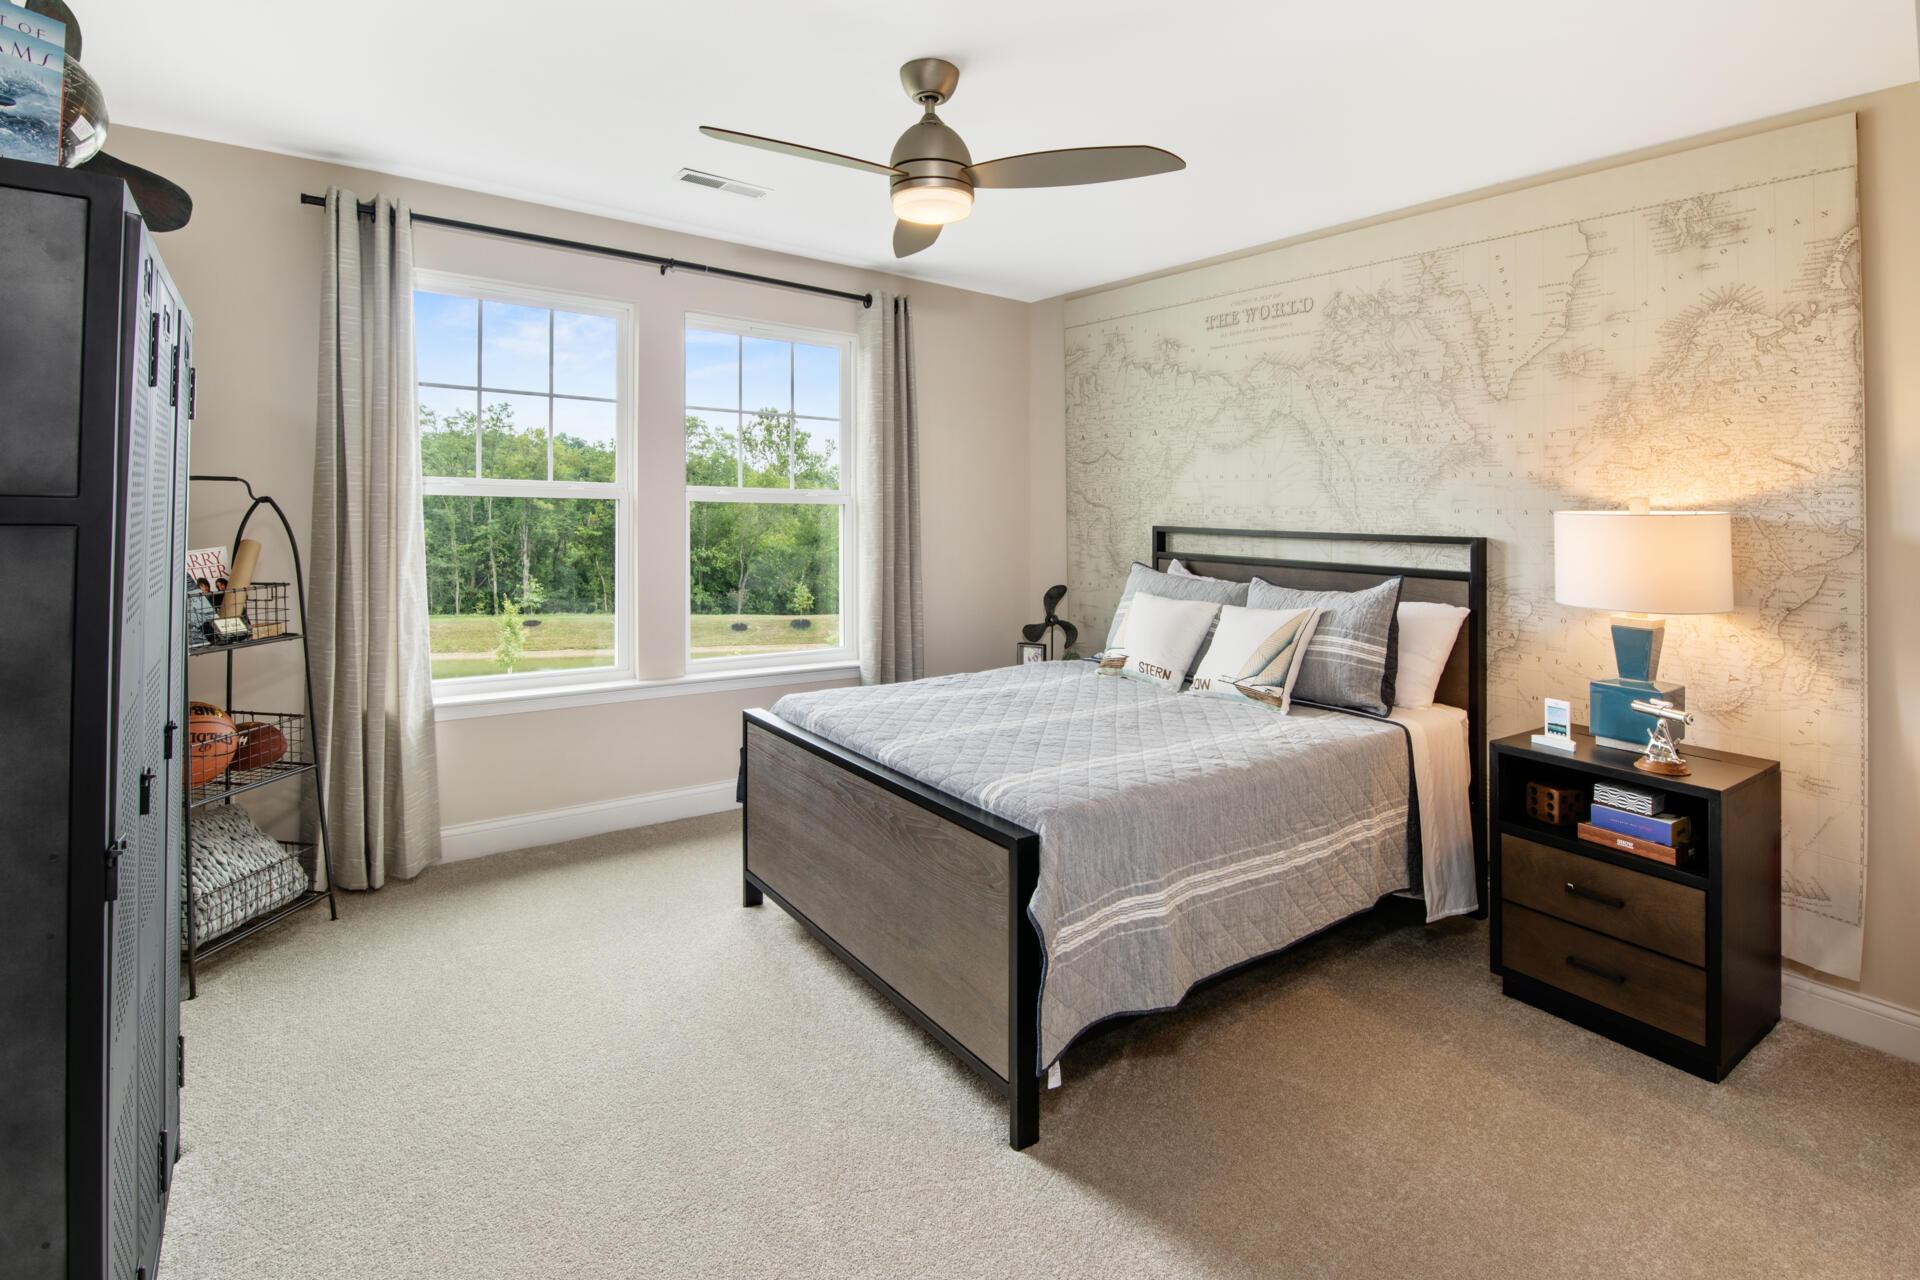 Bedroom featured in the Alden By Drees Homes in Cincinnati, OH